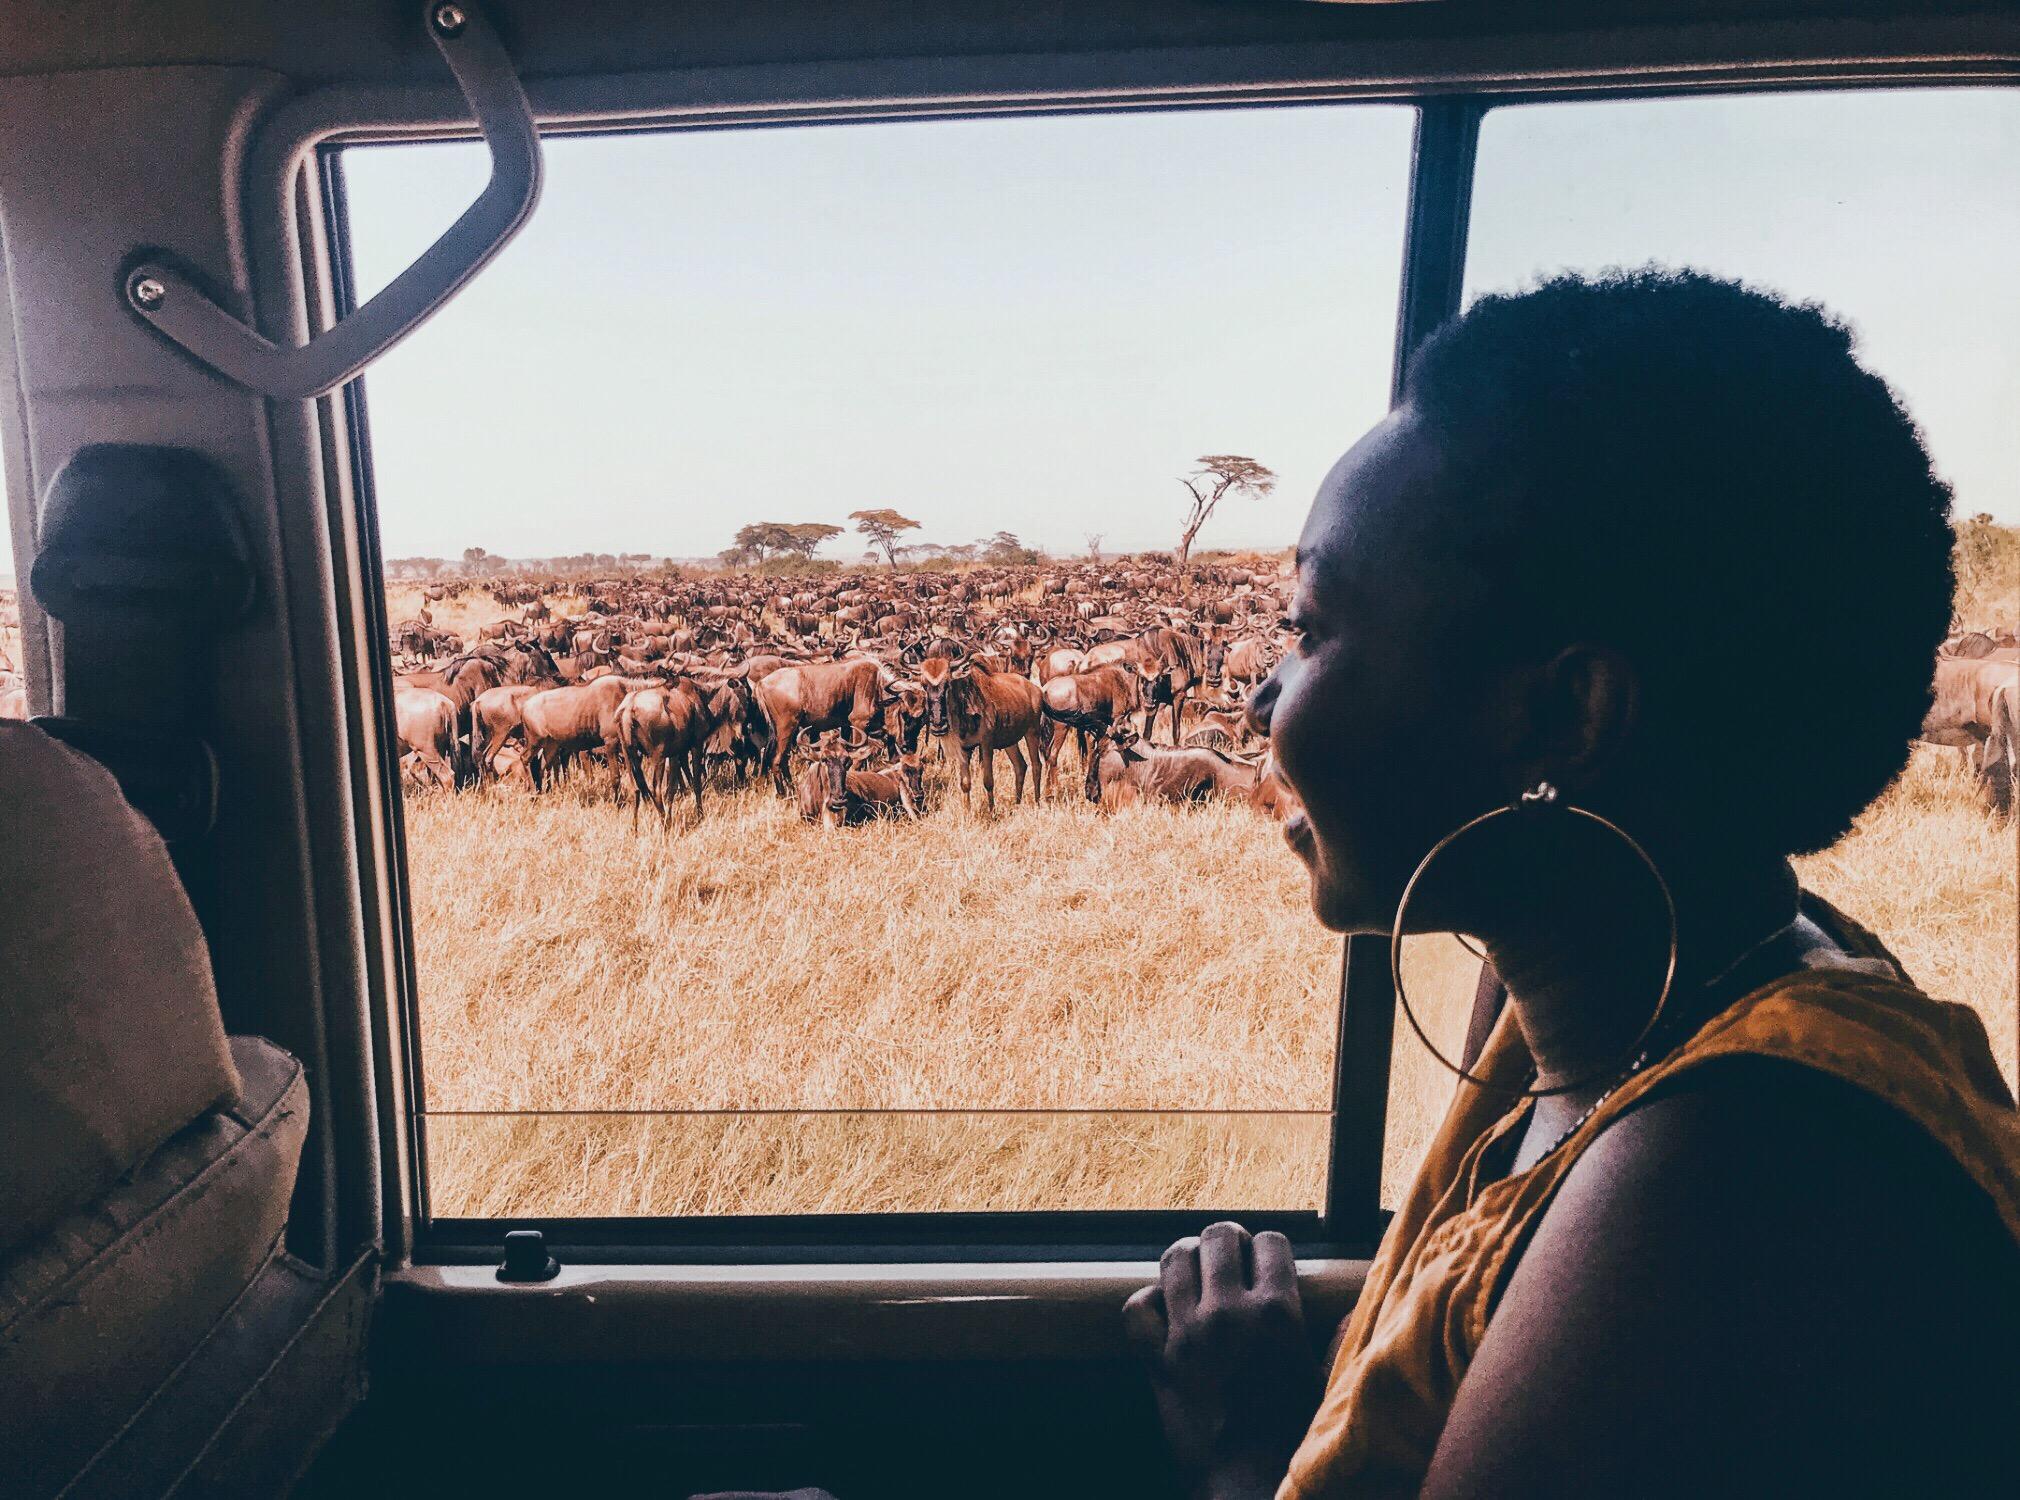 overlooking the Serengeti